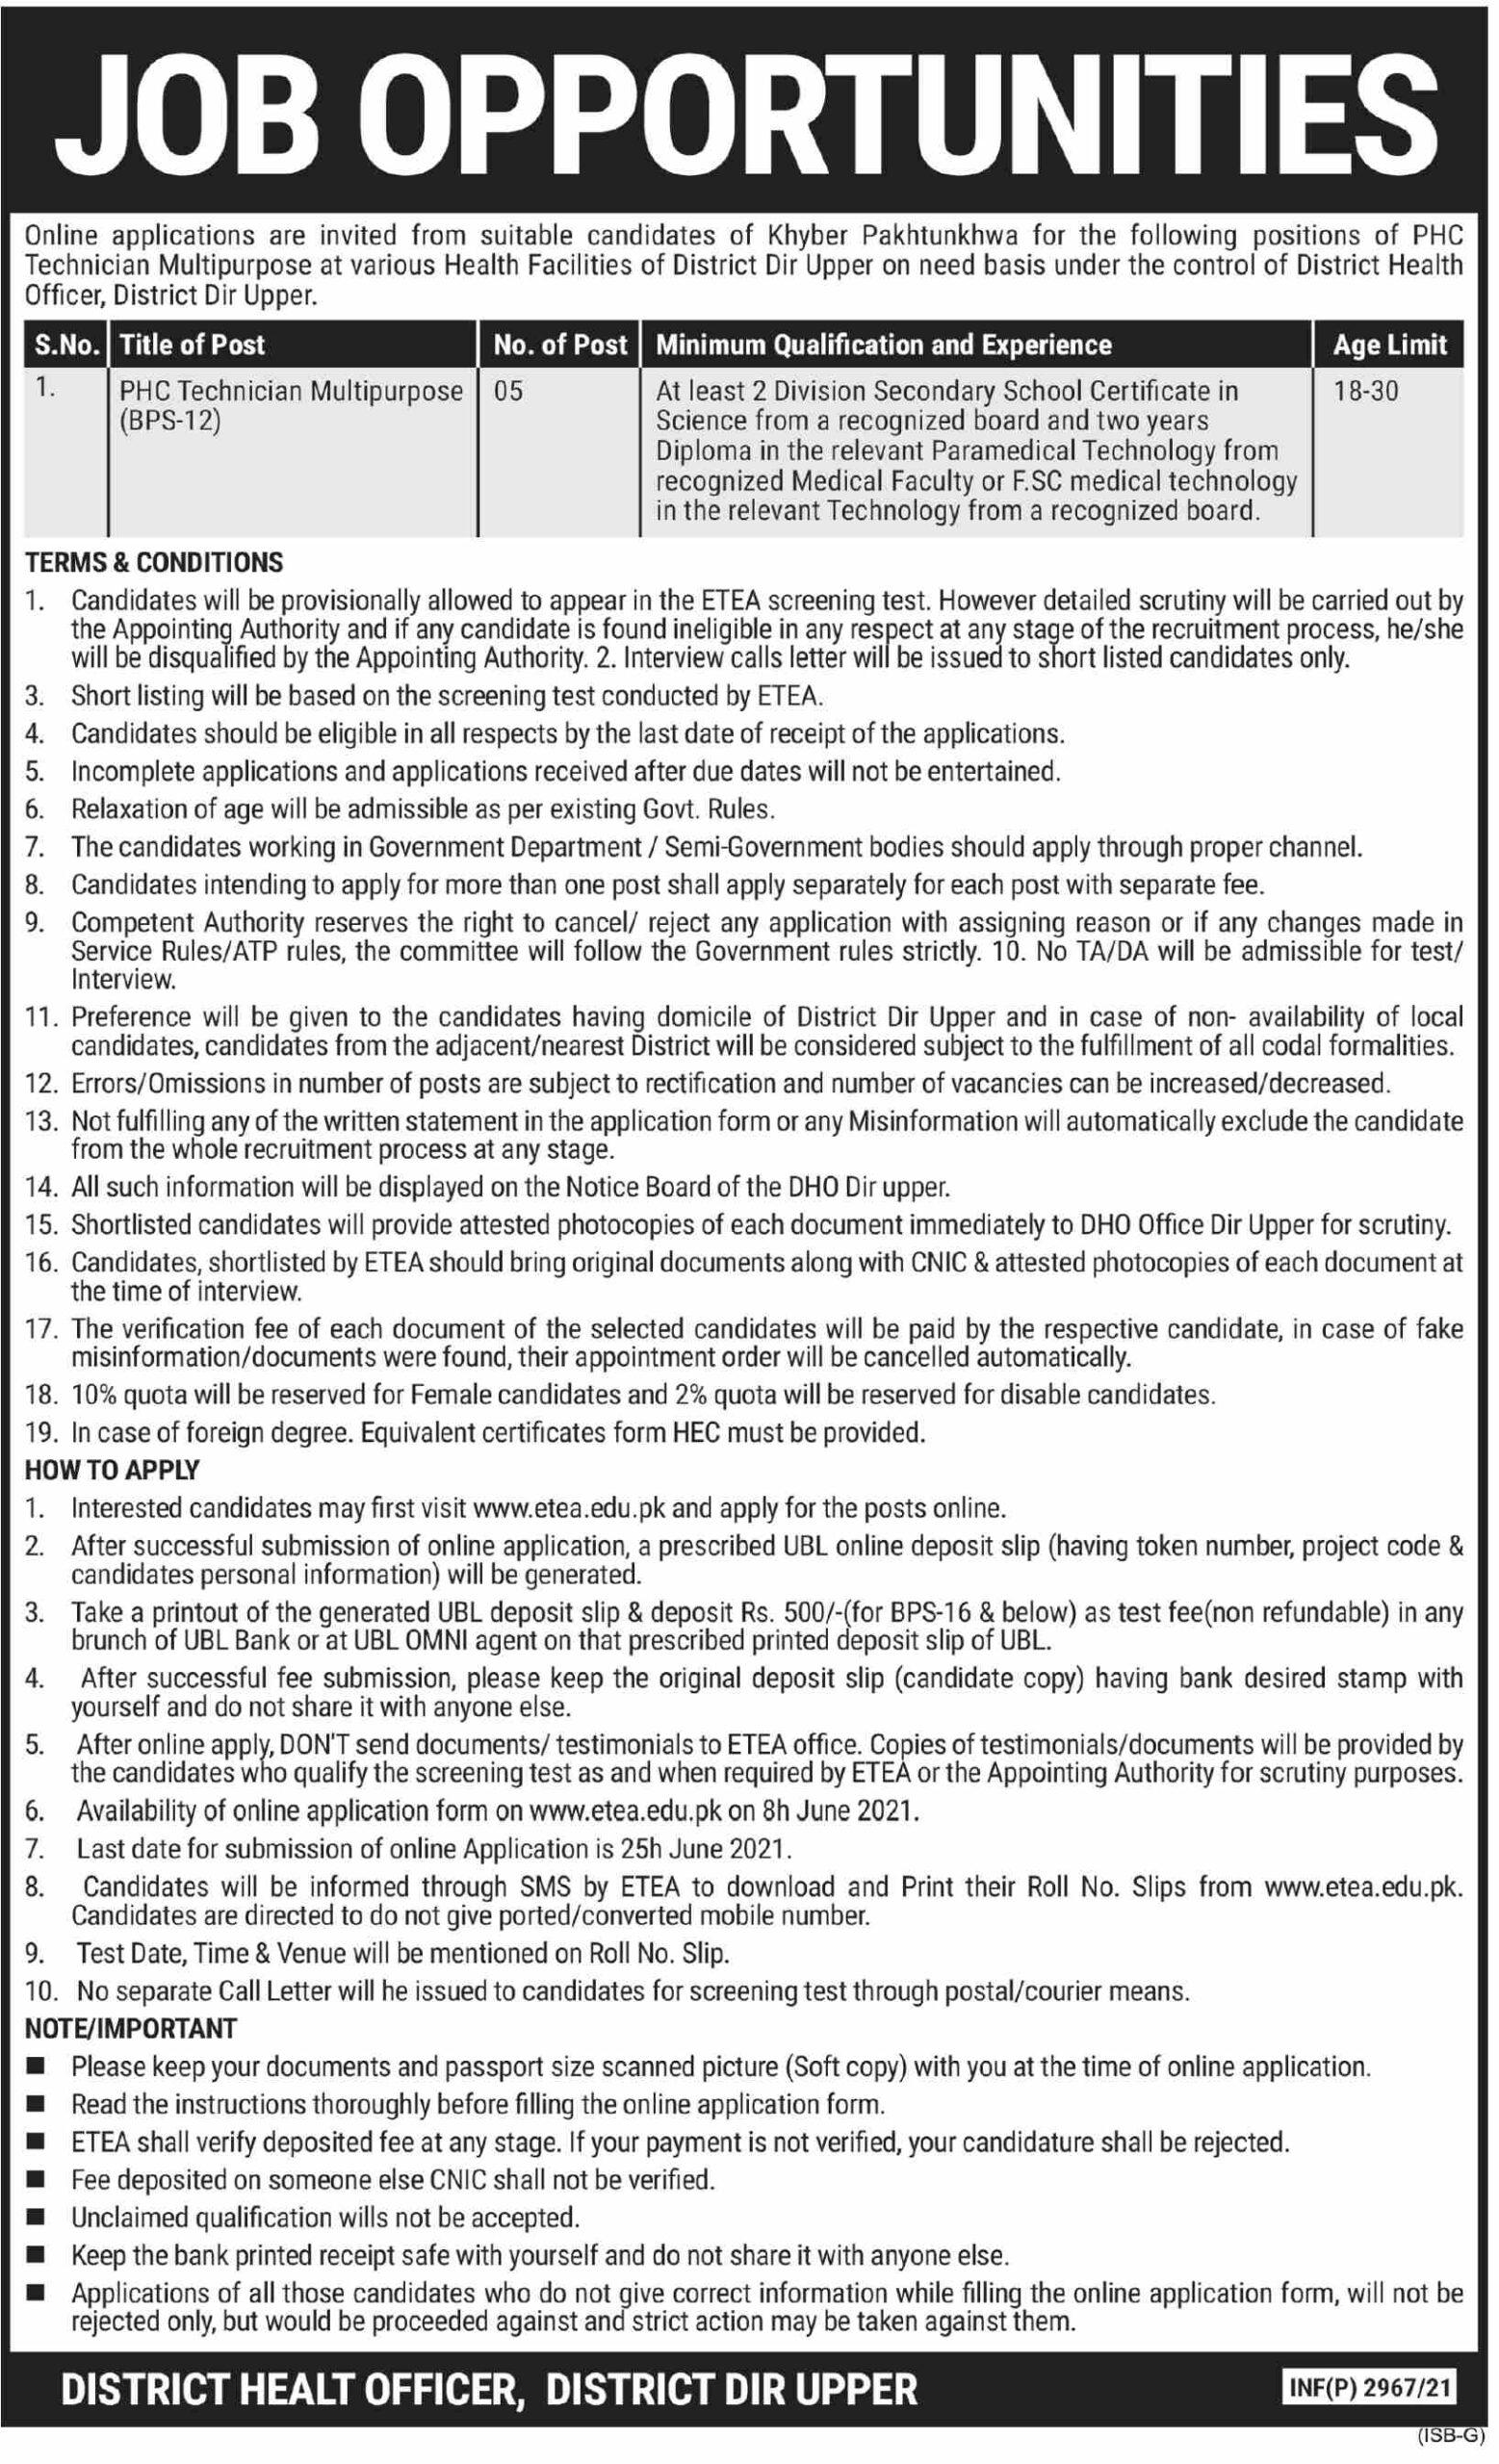 KPK Health Department District Dir Upper Jobs June 2021